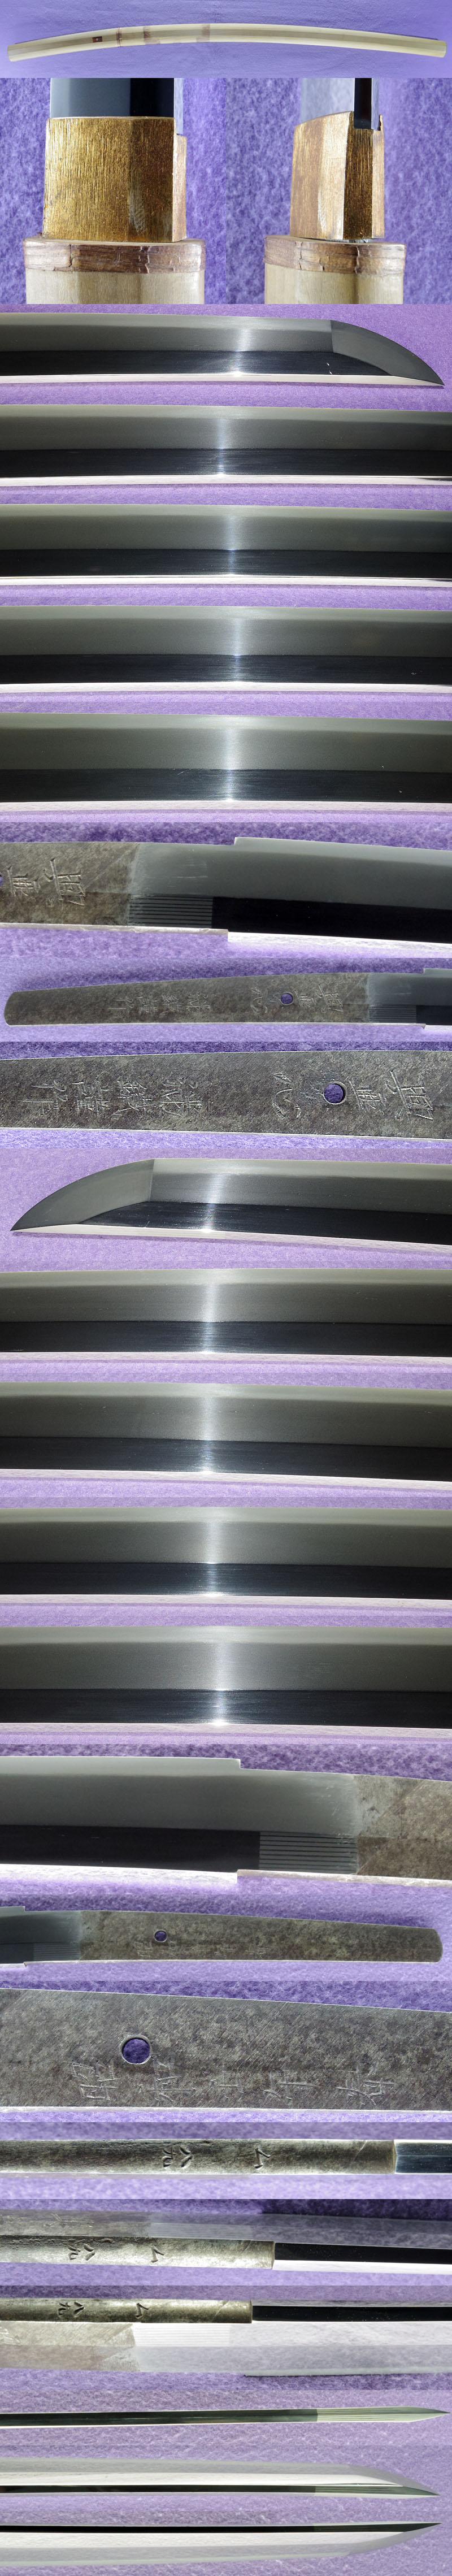 興亜一心満織謹作 (満鉄刀) Picture of parts